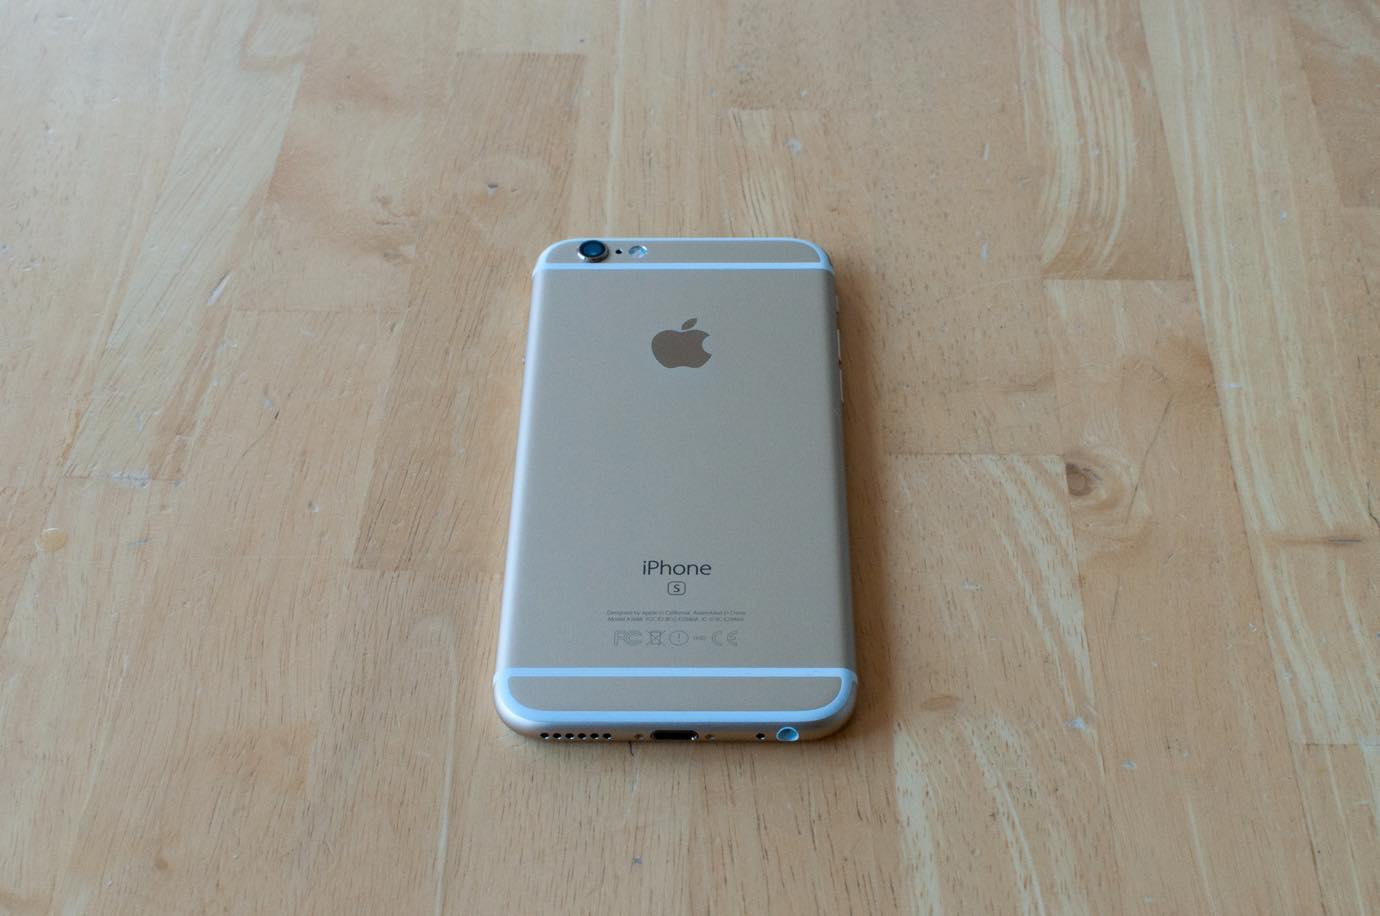 IPhone6s 03 20151005 232050